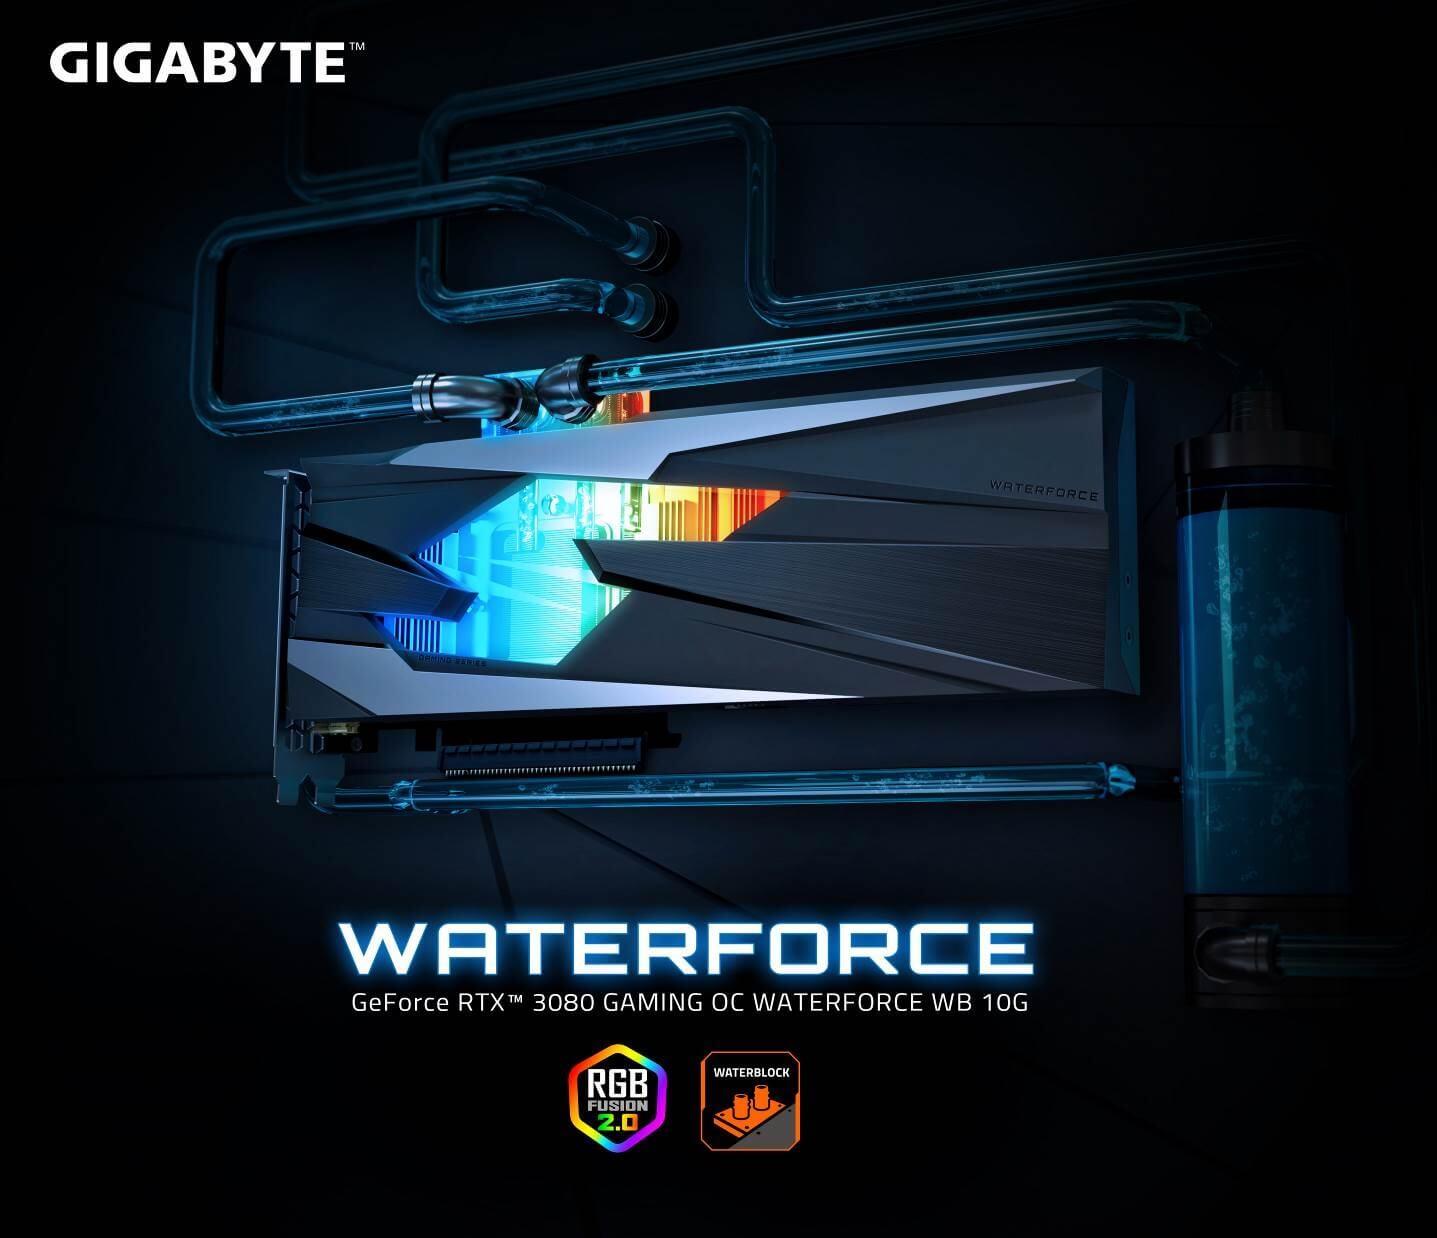 技嘉隆重推出GeForce RTX™ 3080 GAMING OC WATERFORCE WB 10G水冷顯示卡